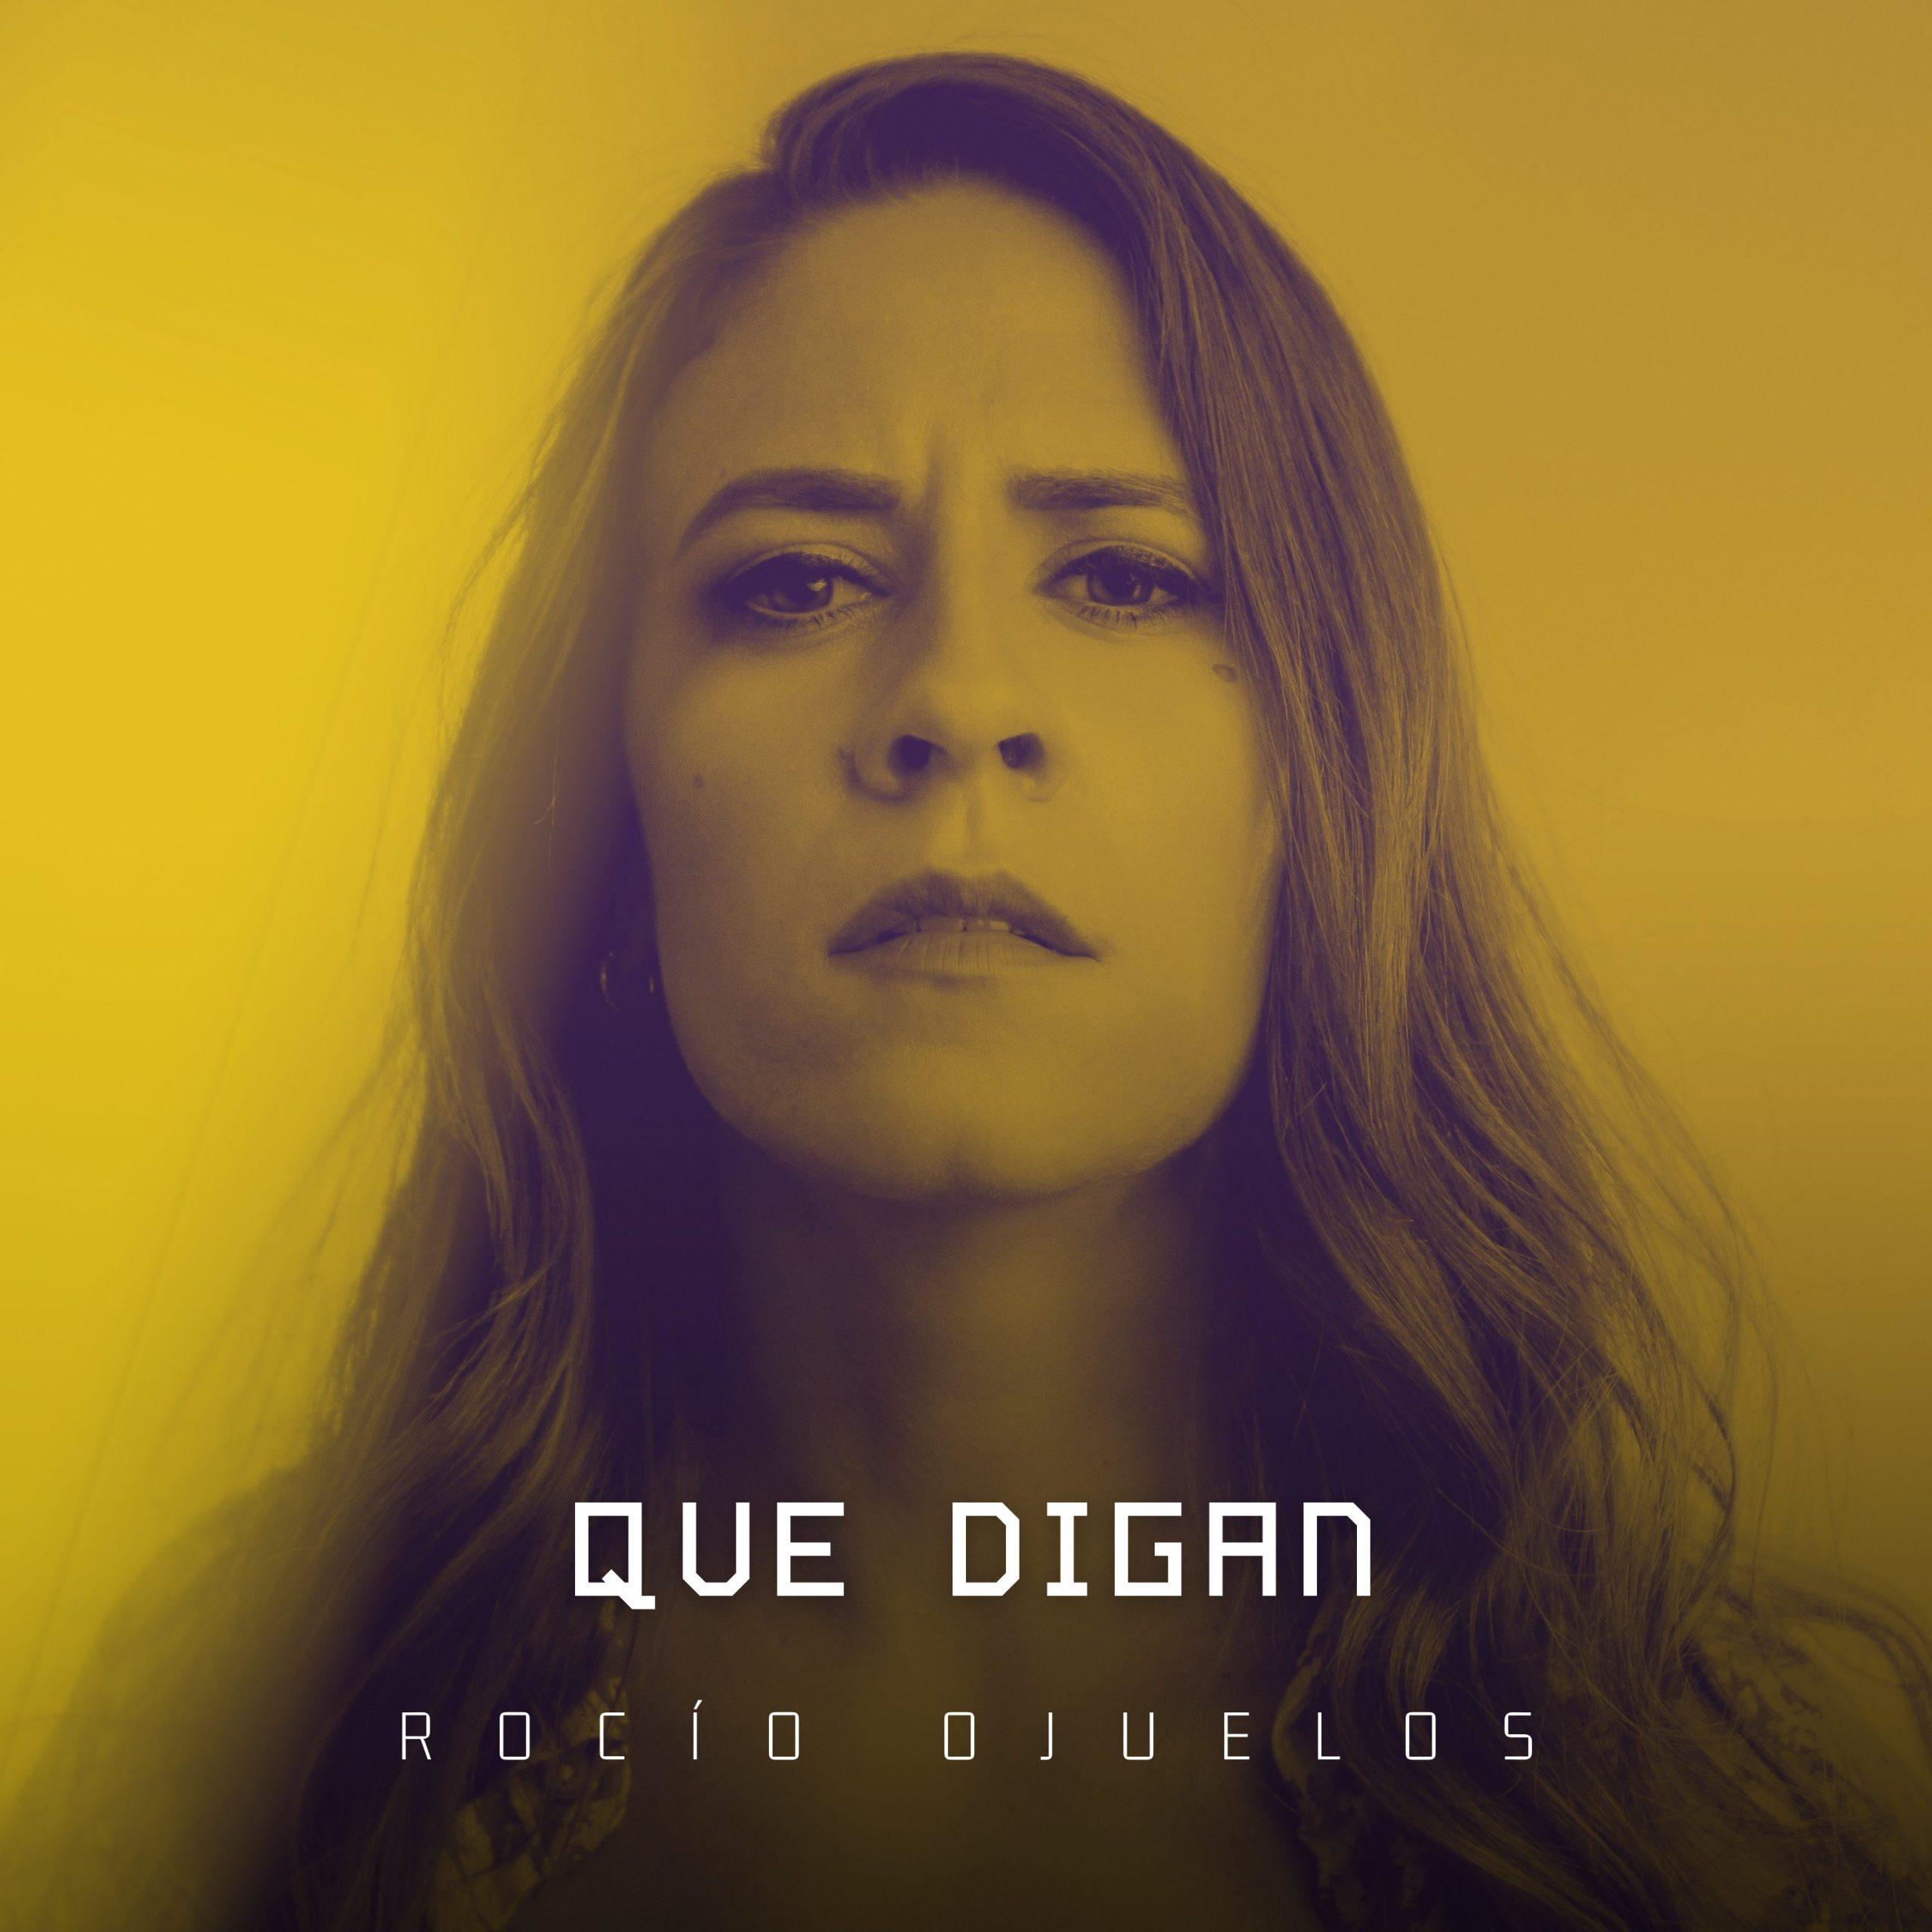 Rocío Ojuelos pop